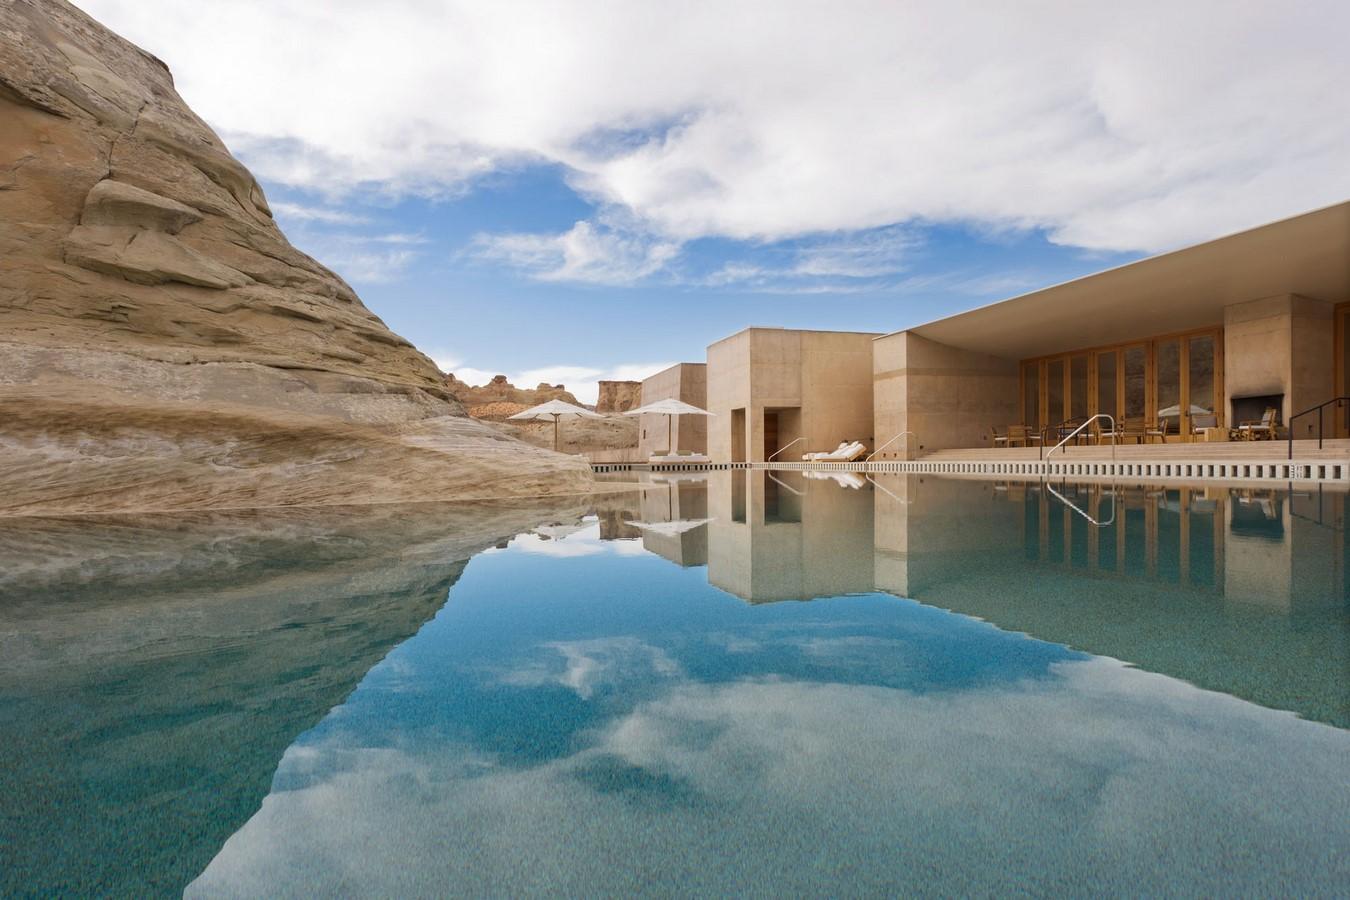 Architects in Tucson - Top 90 Architects in Tucson - Sheet6